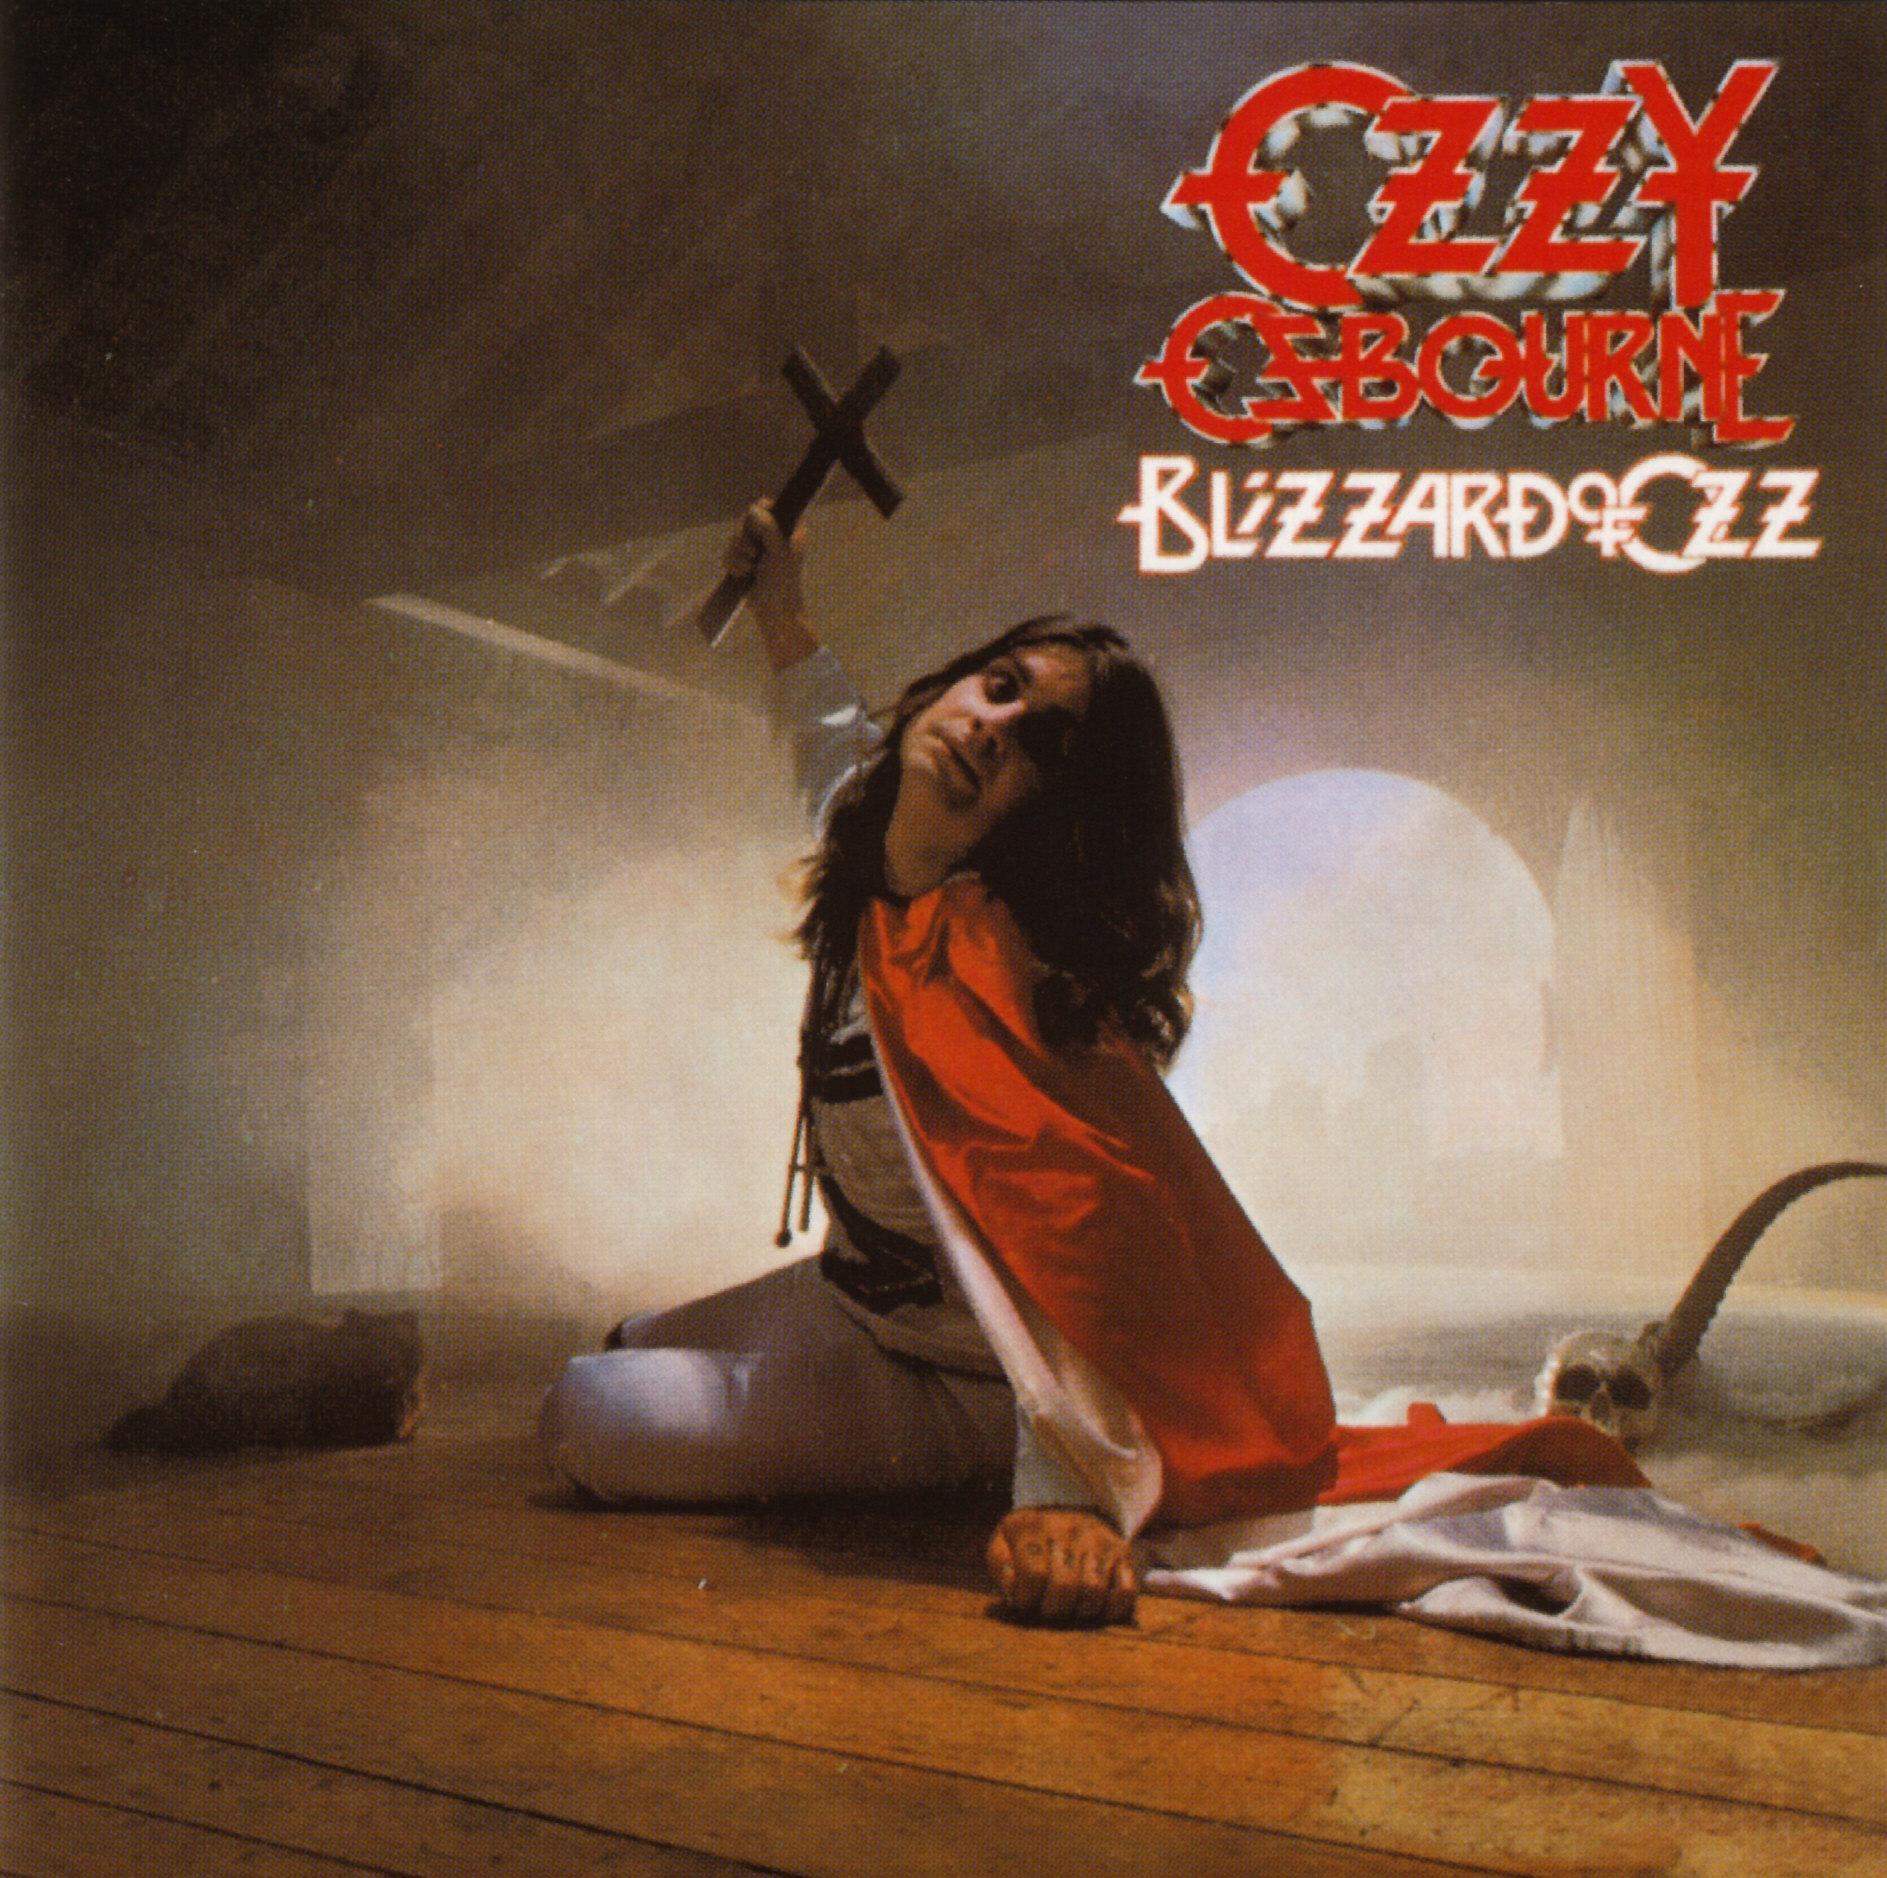 Ozzy Osbourne - Blizzard Of Ozz - Front